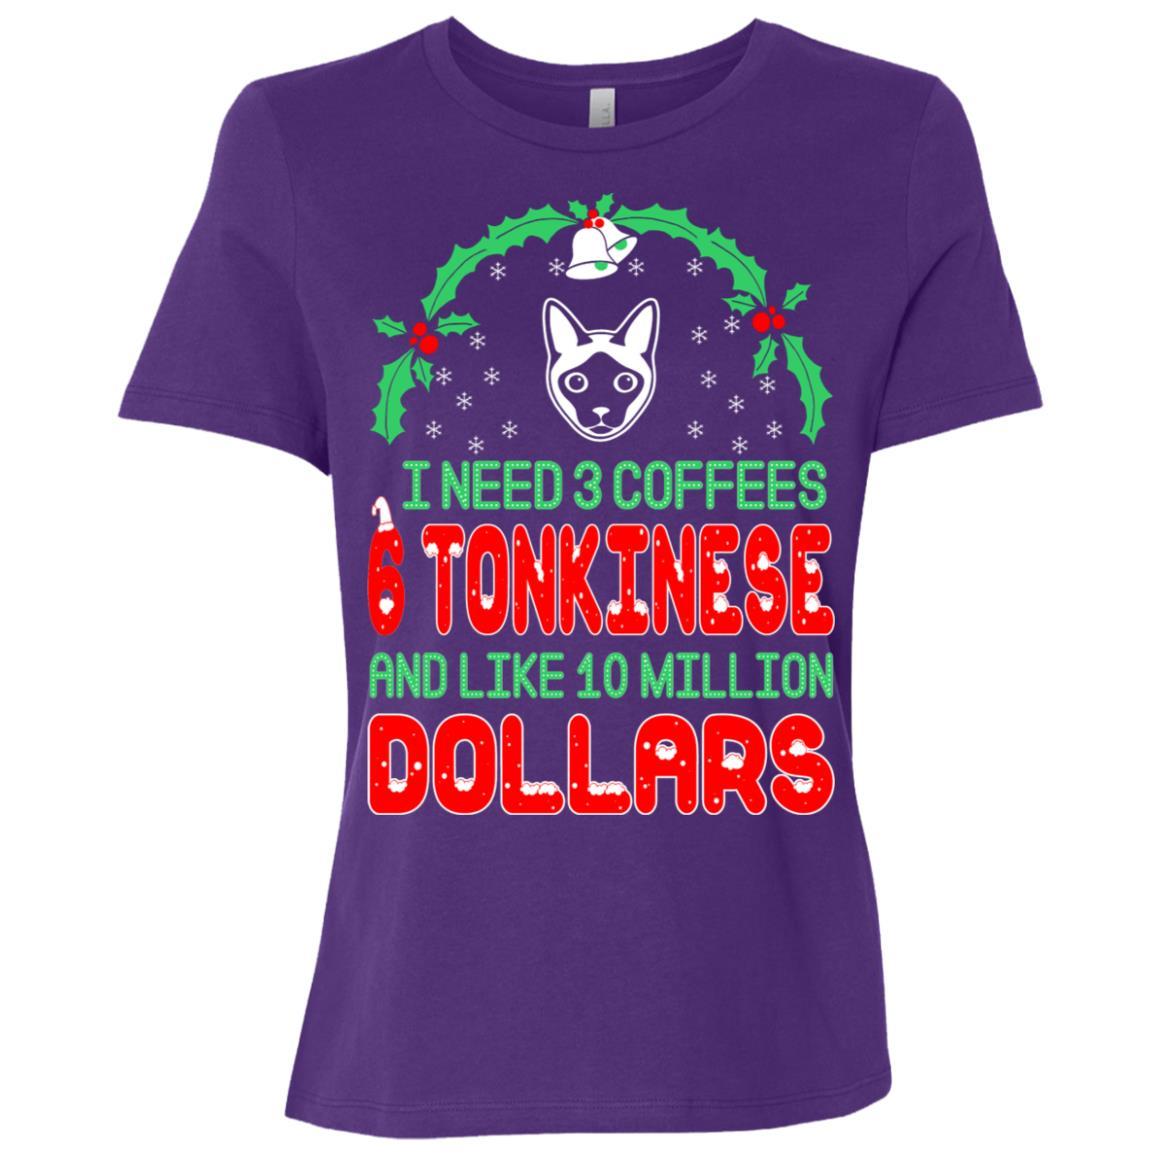 Need 3 Coffees 6 Tonkinese Christmas Ugly Sweater-1 Women Short Sleeve T-Shirt